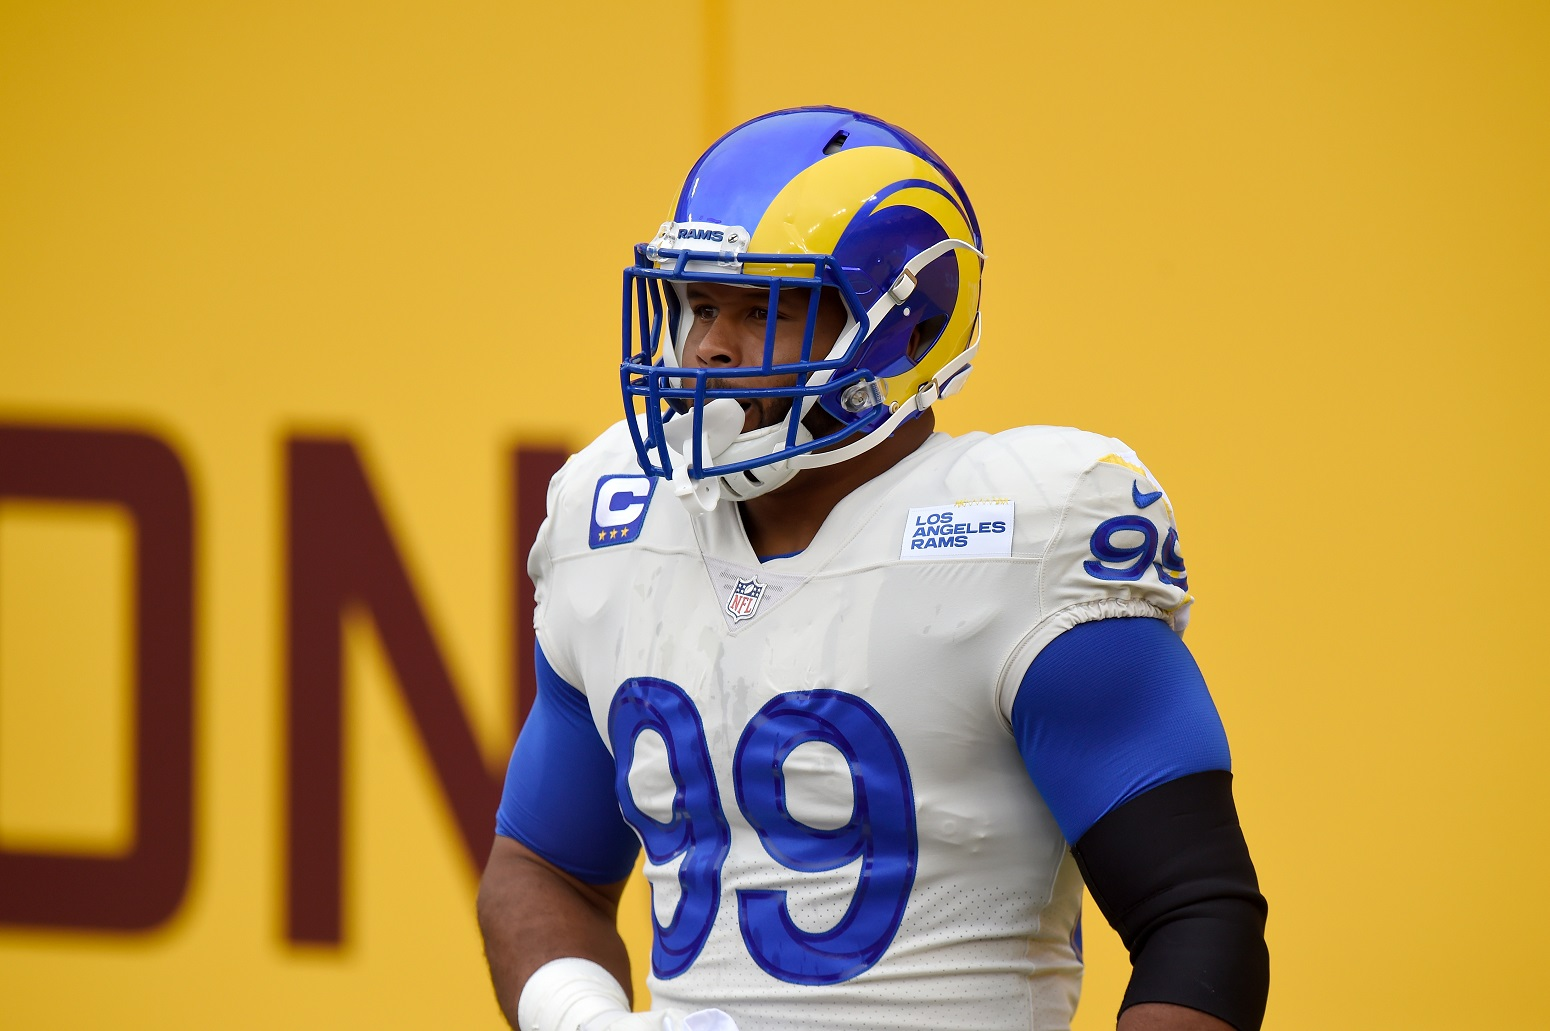 Why Aaron Donald wears No. 99 LA Rams